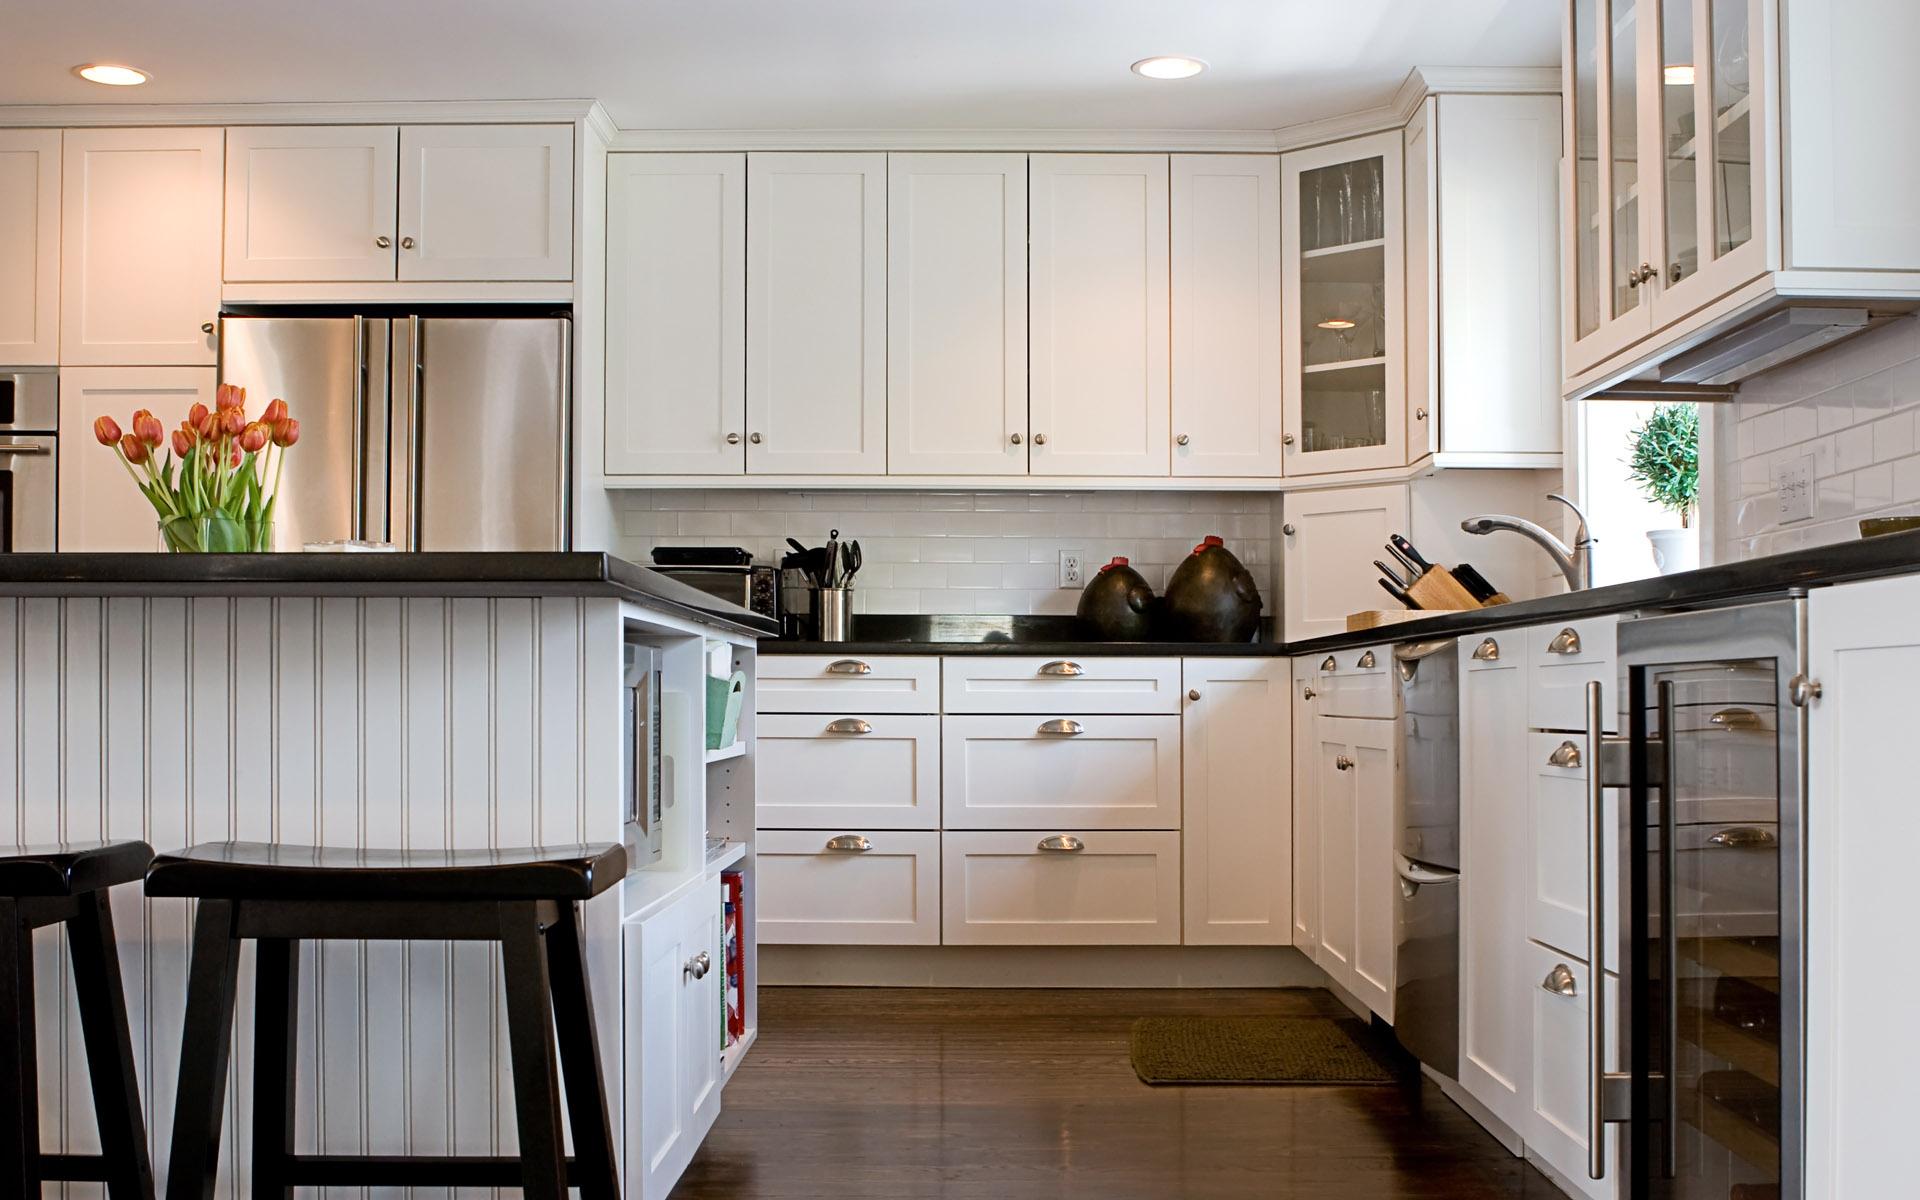 Food Room Interior Kitchen Interior Design Cottage Estate Floor Style Home  Hardwood Cuisine Apartment Furniture Property